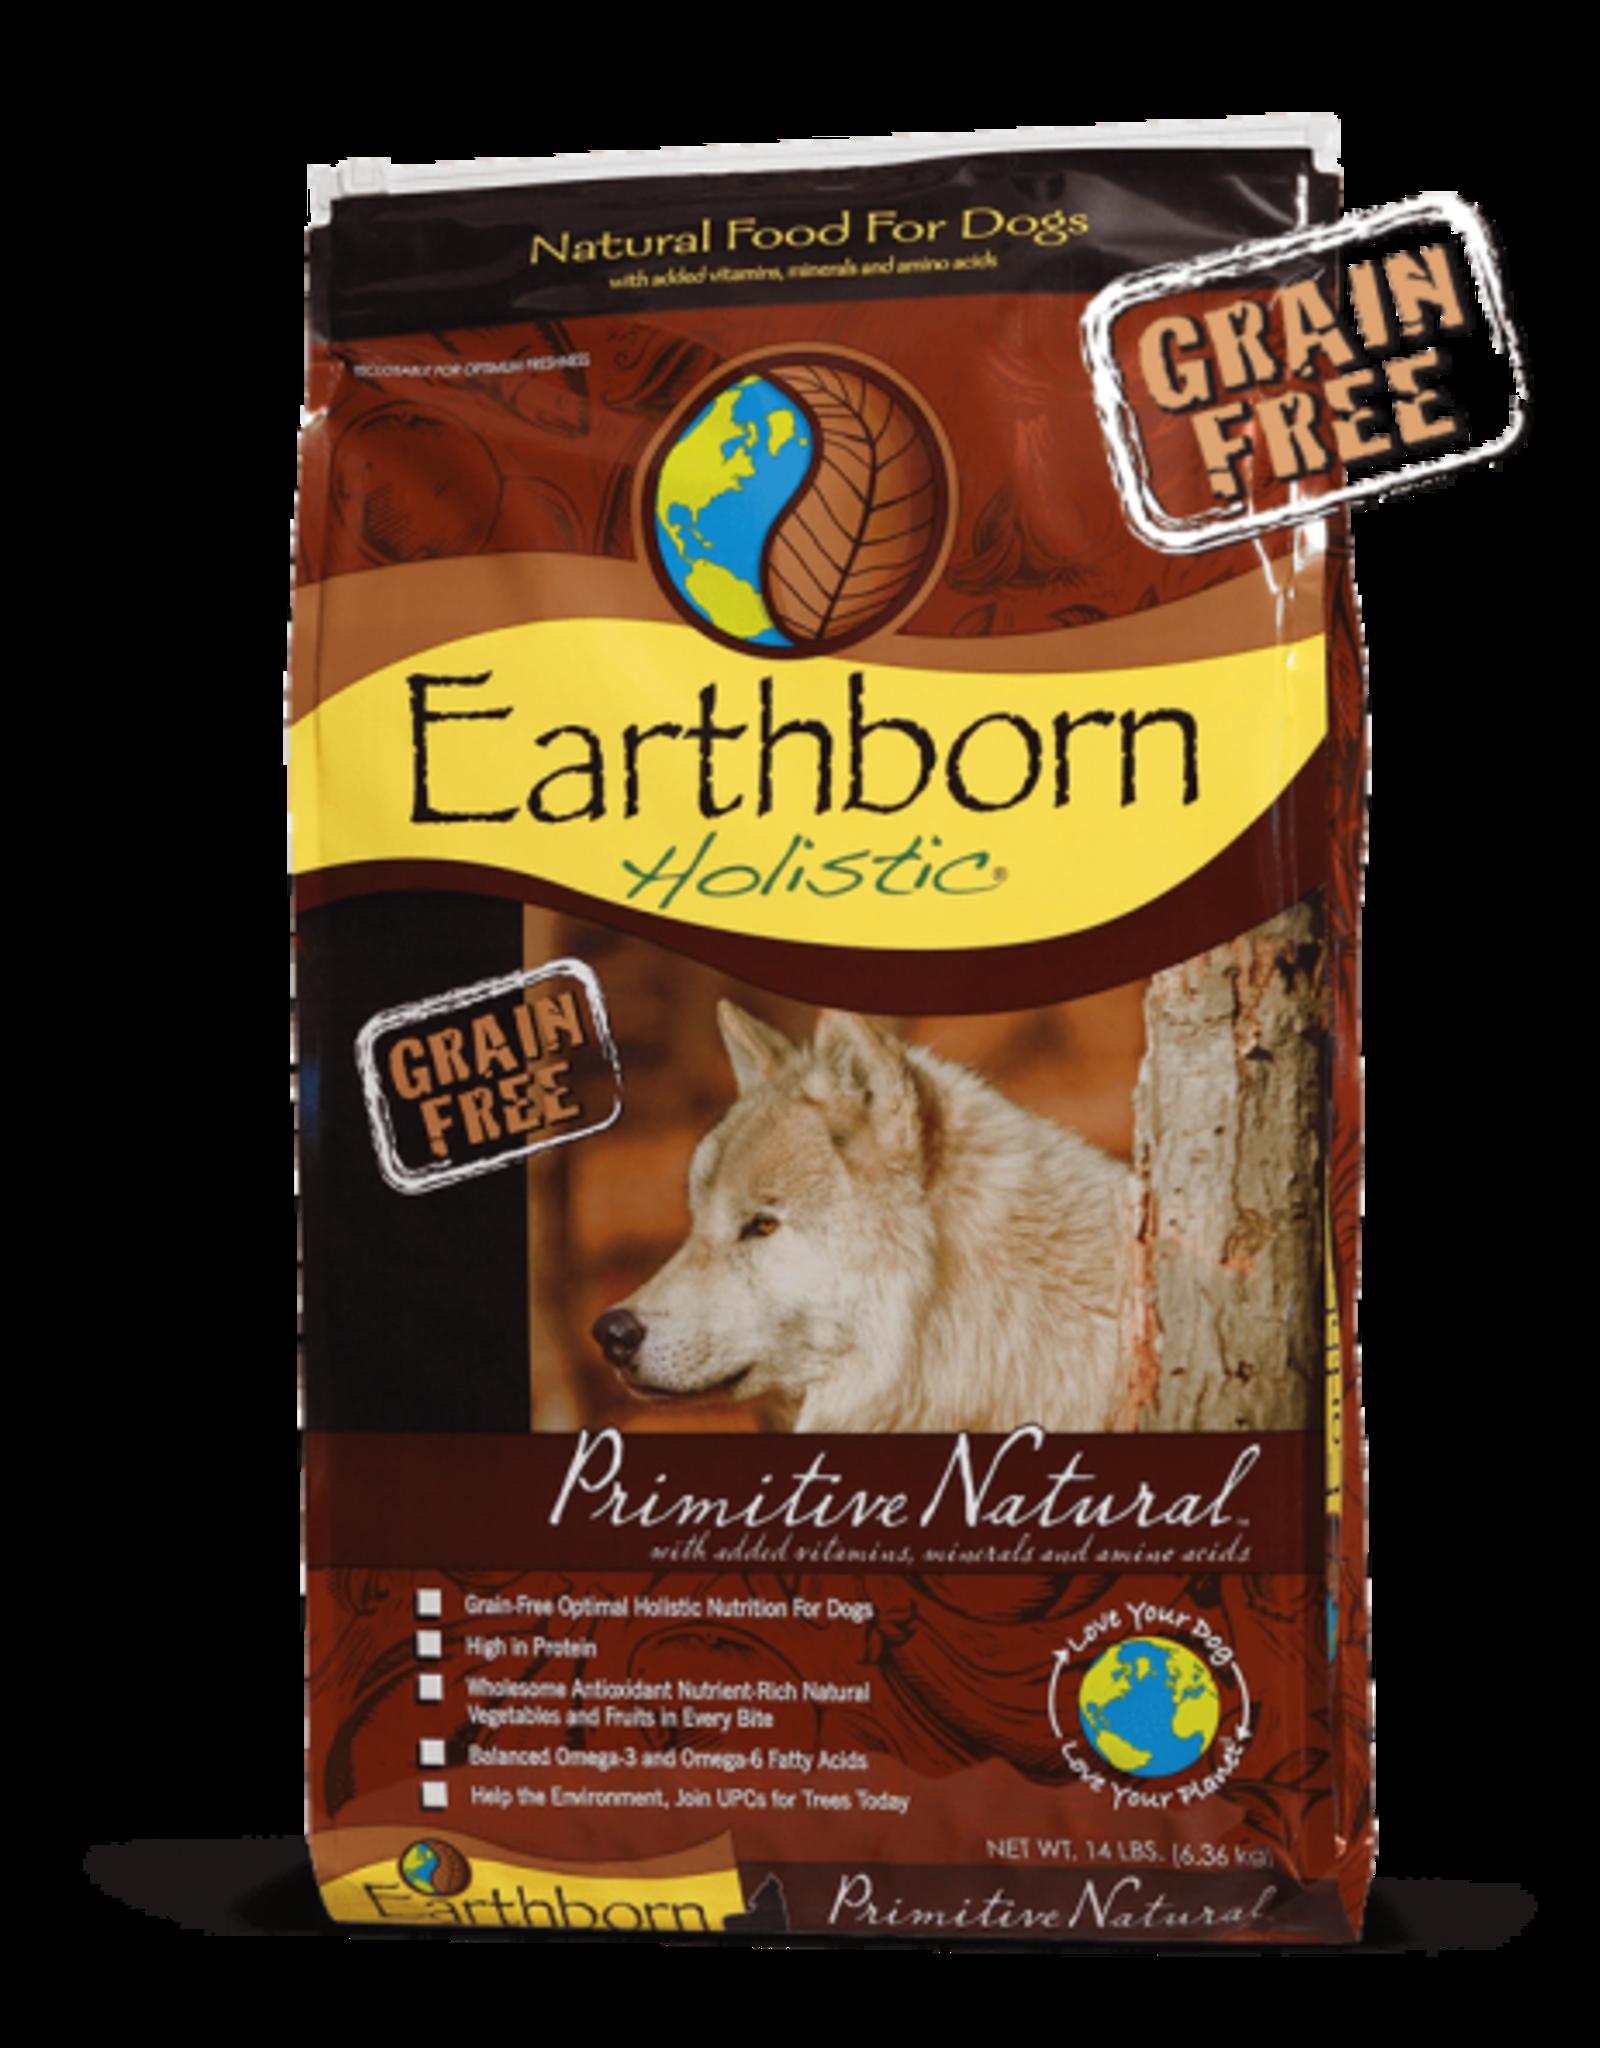 EARTHBORN EARTHBORN HOLISTIC DOG PRIMITIVE NATURAL 5LBS